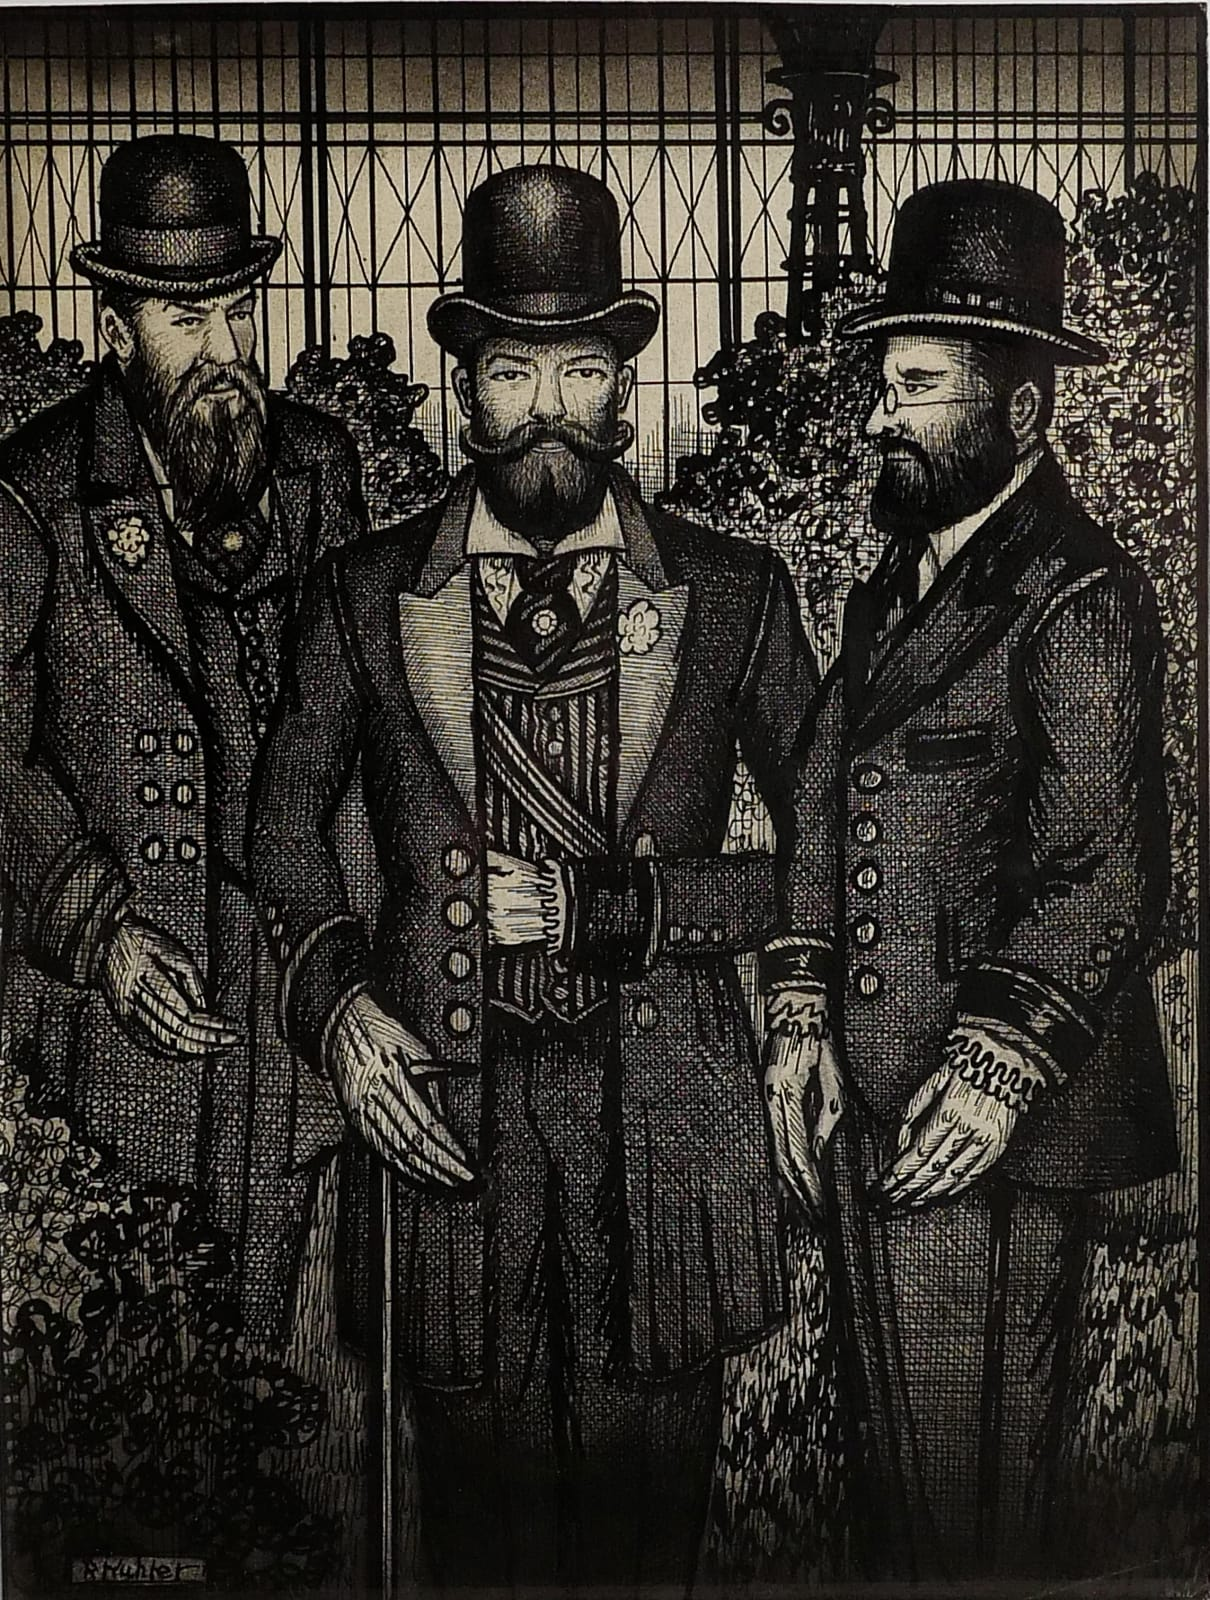 Josip Wepka, Nikolai Romanovski & Gorghendi Kahn at Crystal Gardens, 1959 Ink on sketch paper 11 1/2 x 8 3/4 in. (RK 102) $7,000 SOLD